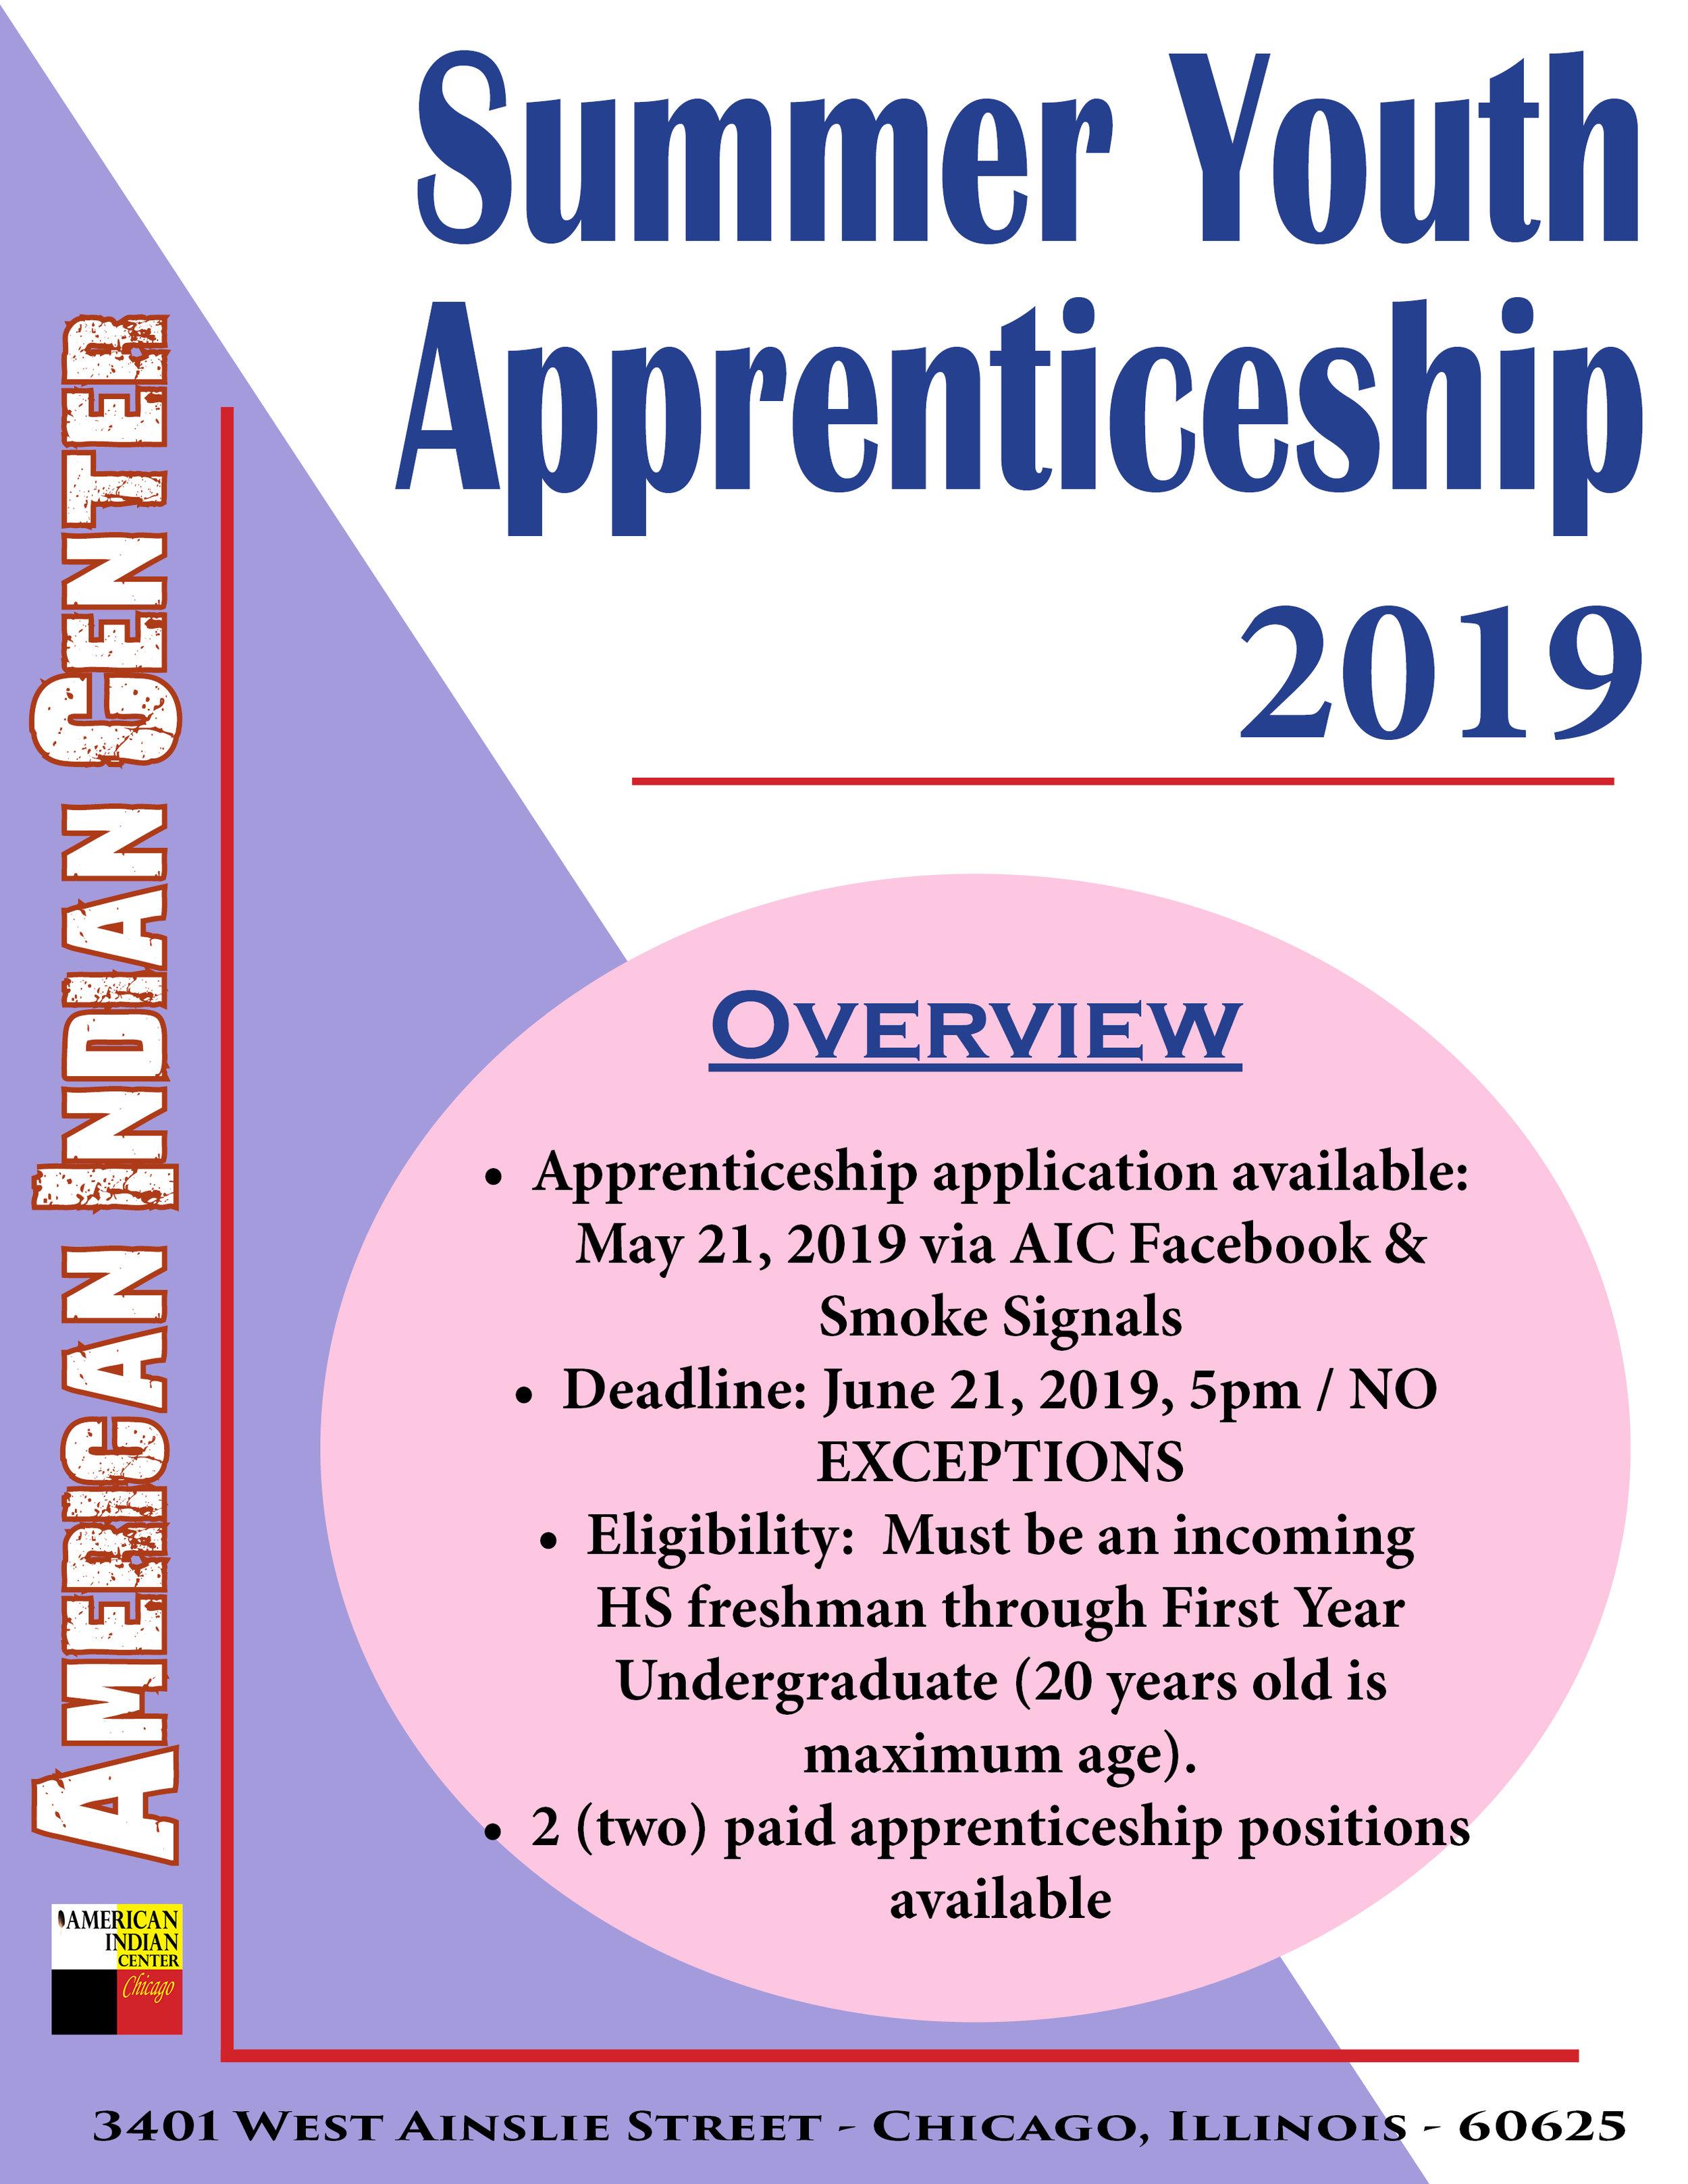 Summer Aprrenticeship_June 2019_FINAL_UPDATED.jpg